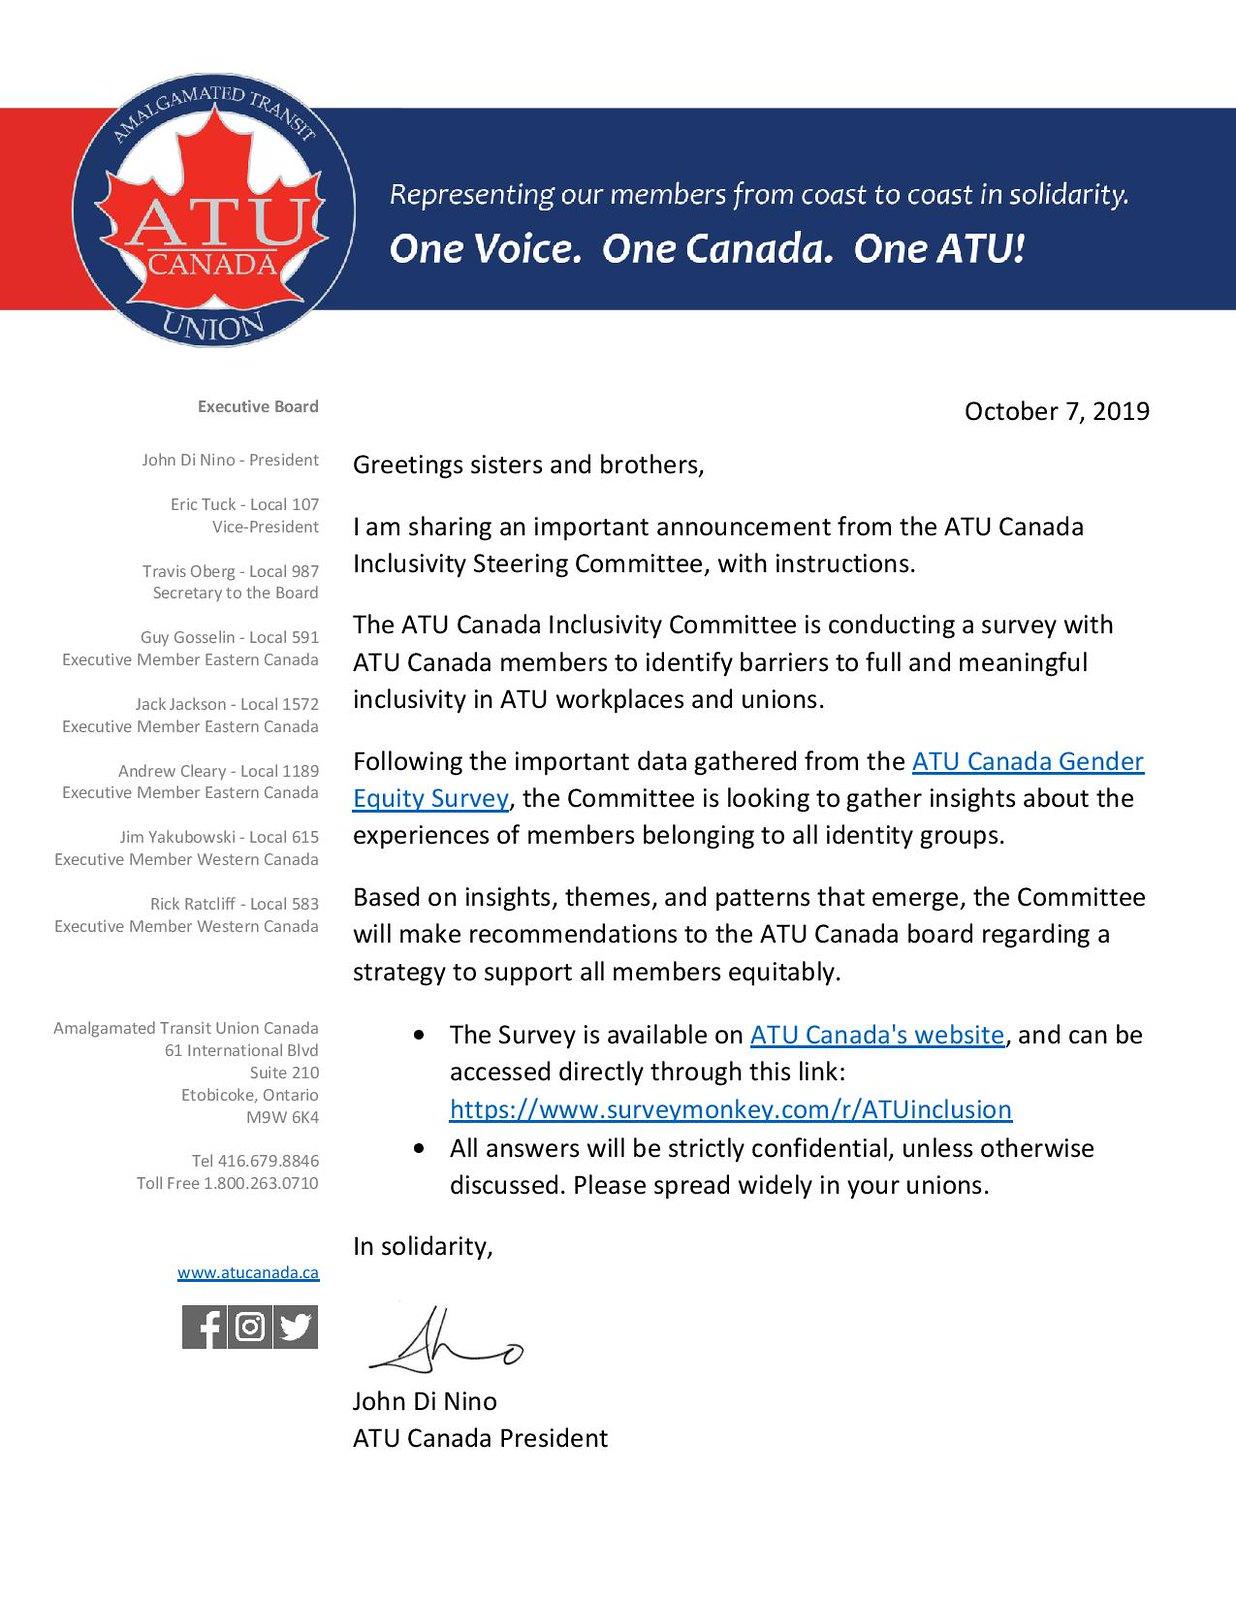 ATU Canada Inclusivity Survey Ask October 7-page-001